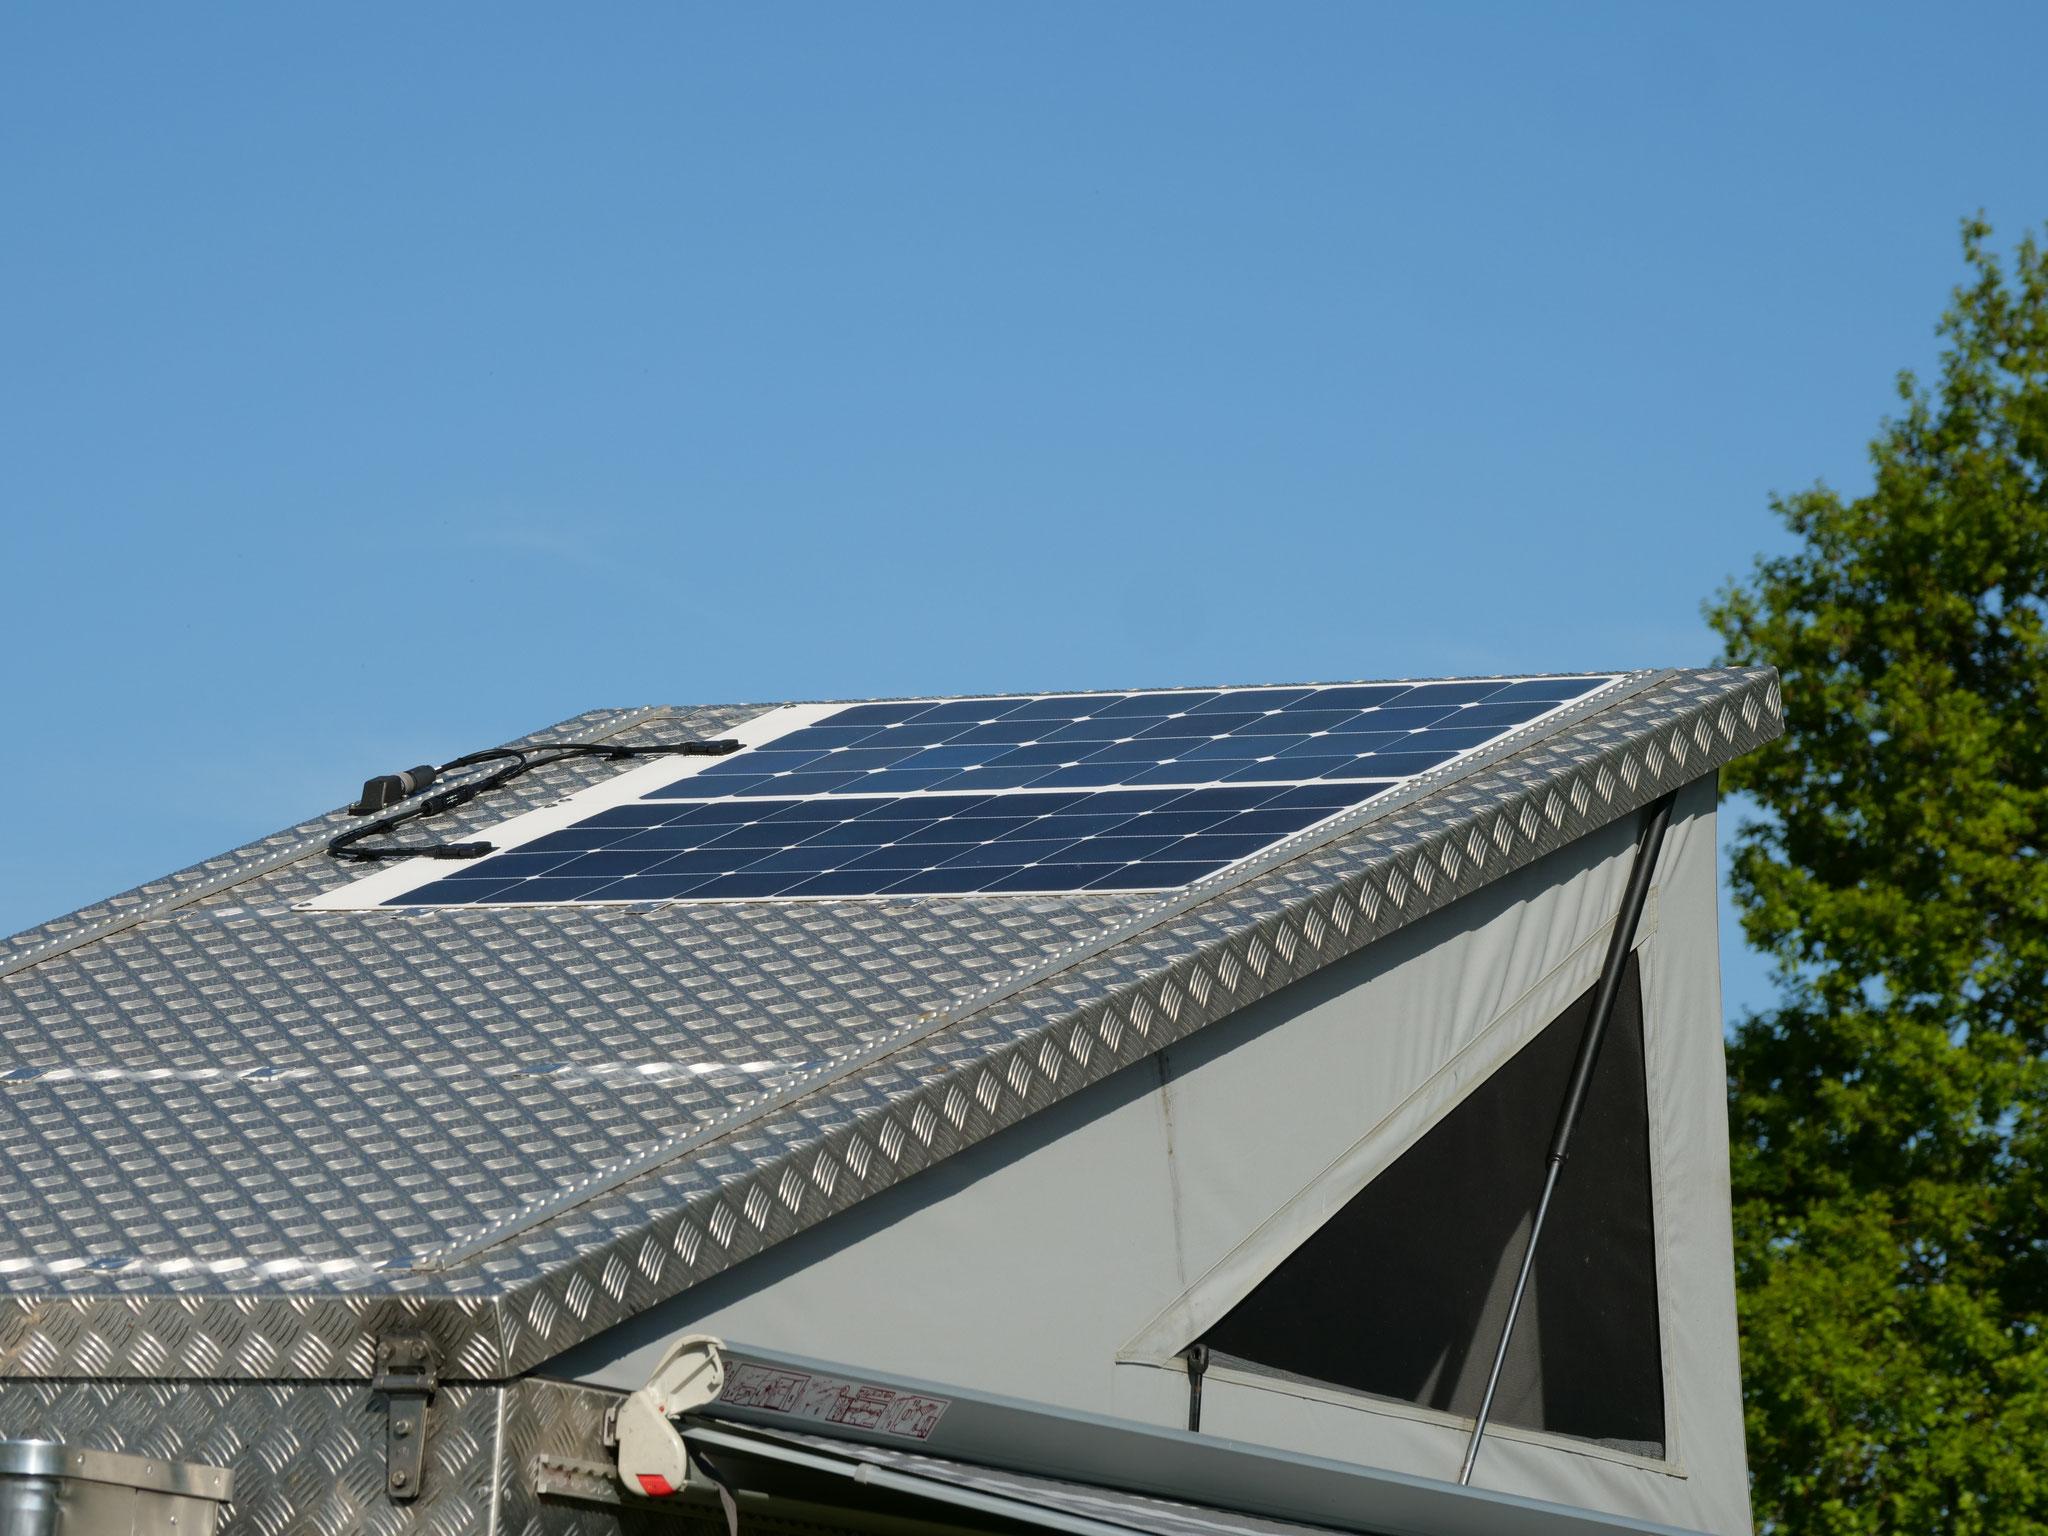 Interieur Rako Schubladen Exkab 1 Toyota Hilux Revo 2017 2.4 #ProjektBlackwolf Solar Sunpower Victron 75/15 Ausbau offroad Tacoma expedition overland wolf78-overland.ch